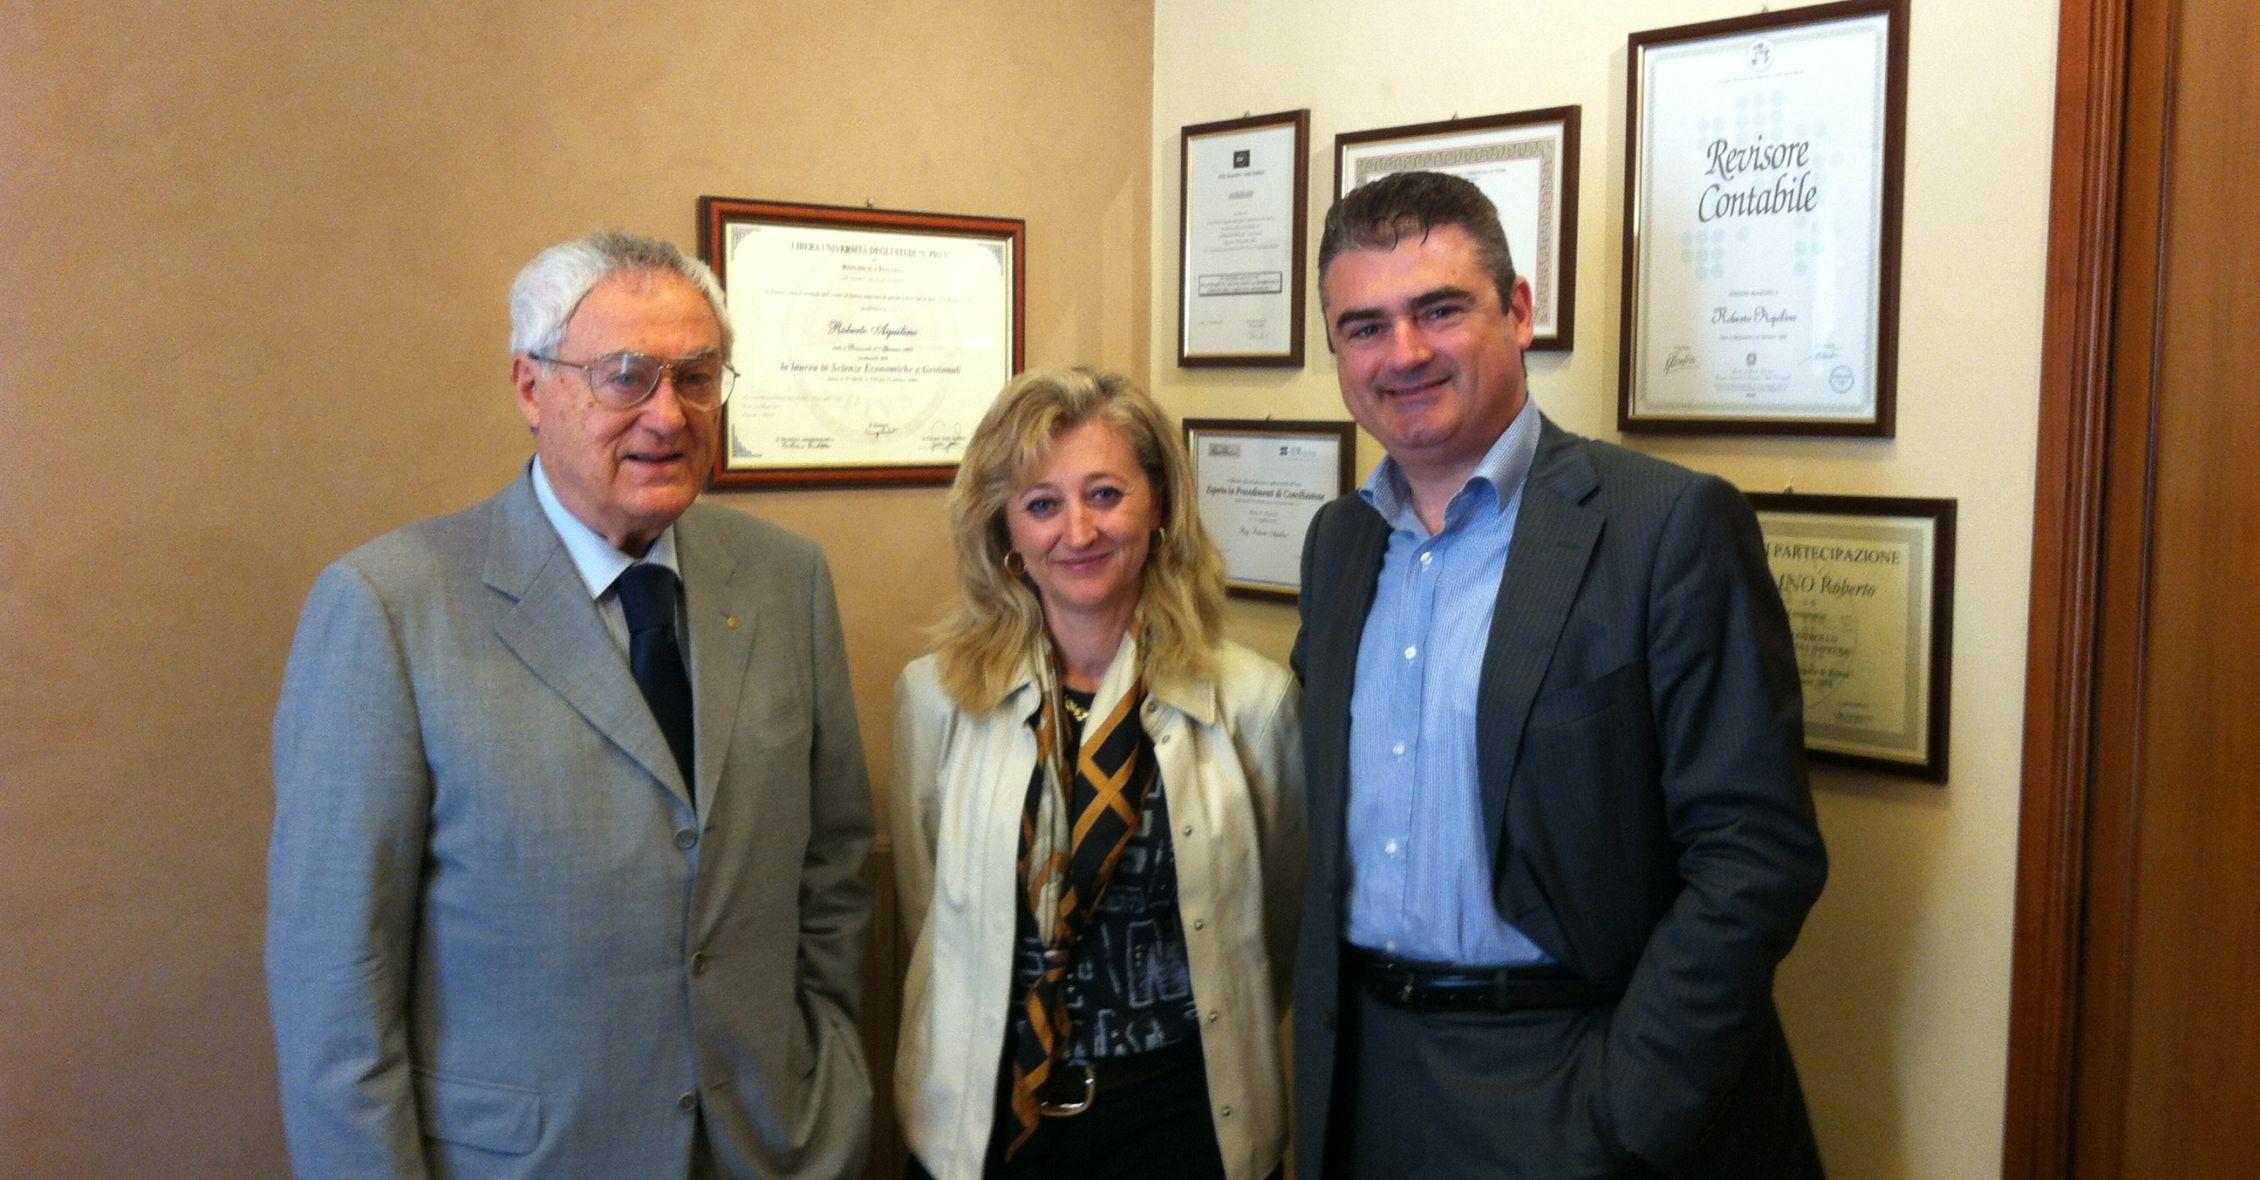 Da sinistra: Dr. Nicolantonio Aquilino, Rag. Laura Lattanzi, Dott. Roberto Aquilino